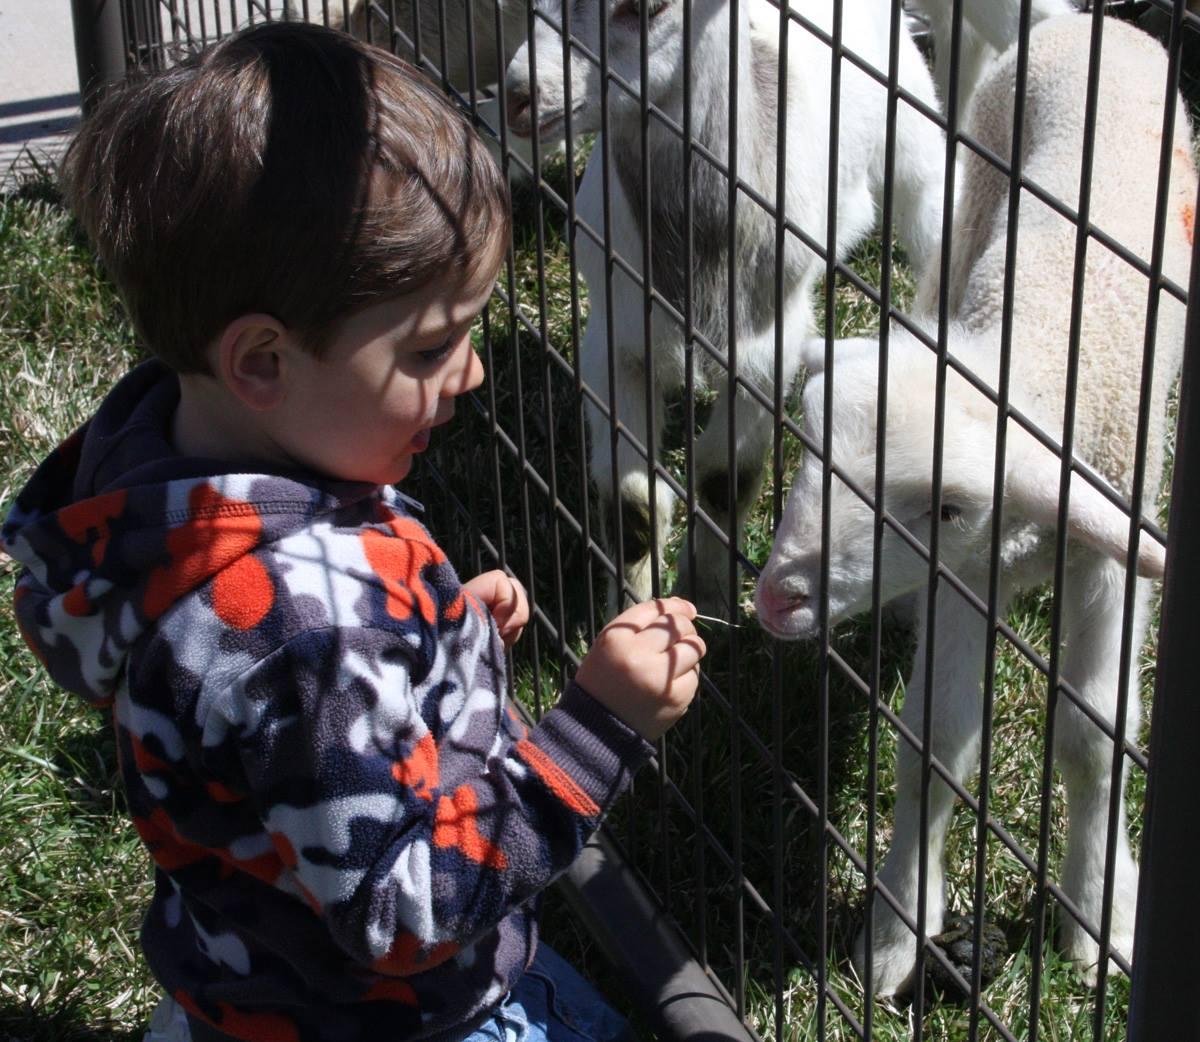 a little boy petting a lamb